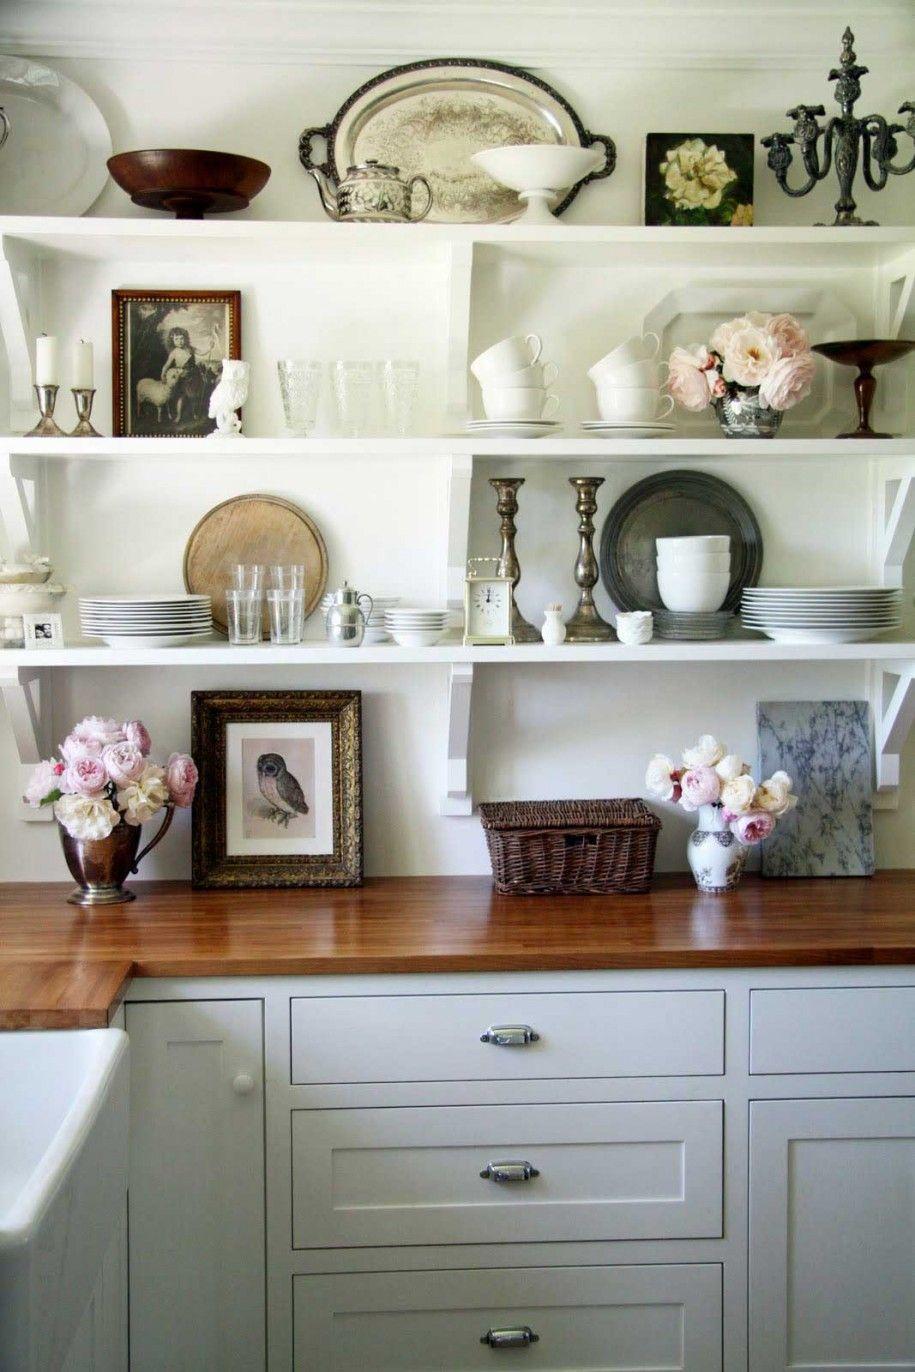 best vintage kitchen design ideas to impress your guests in